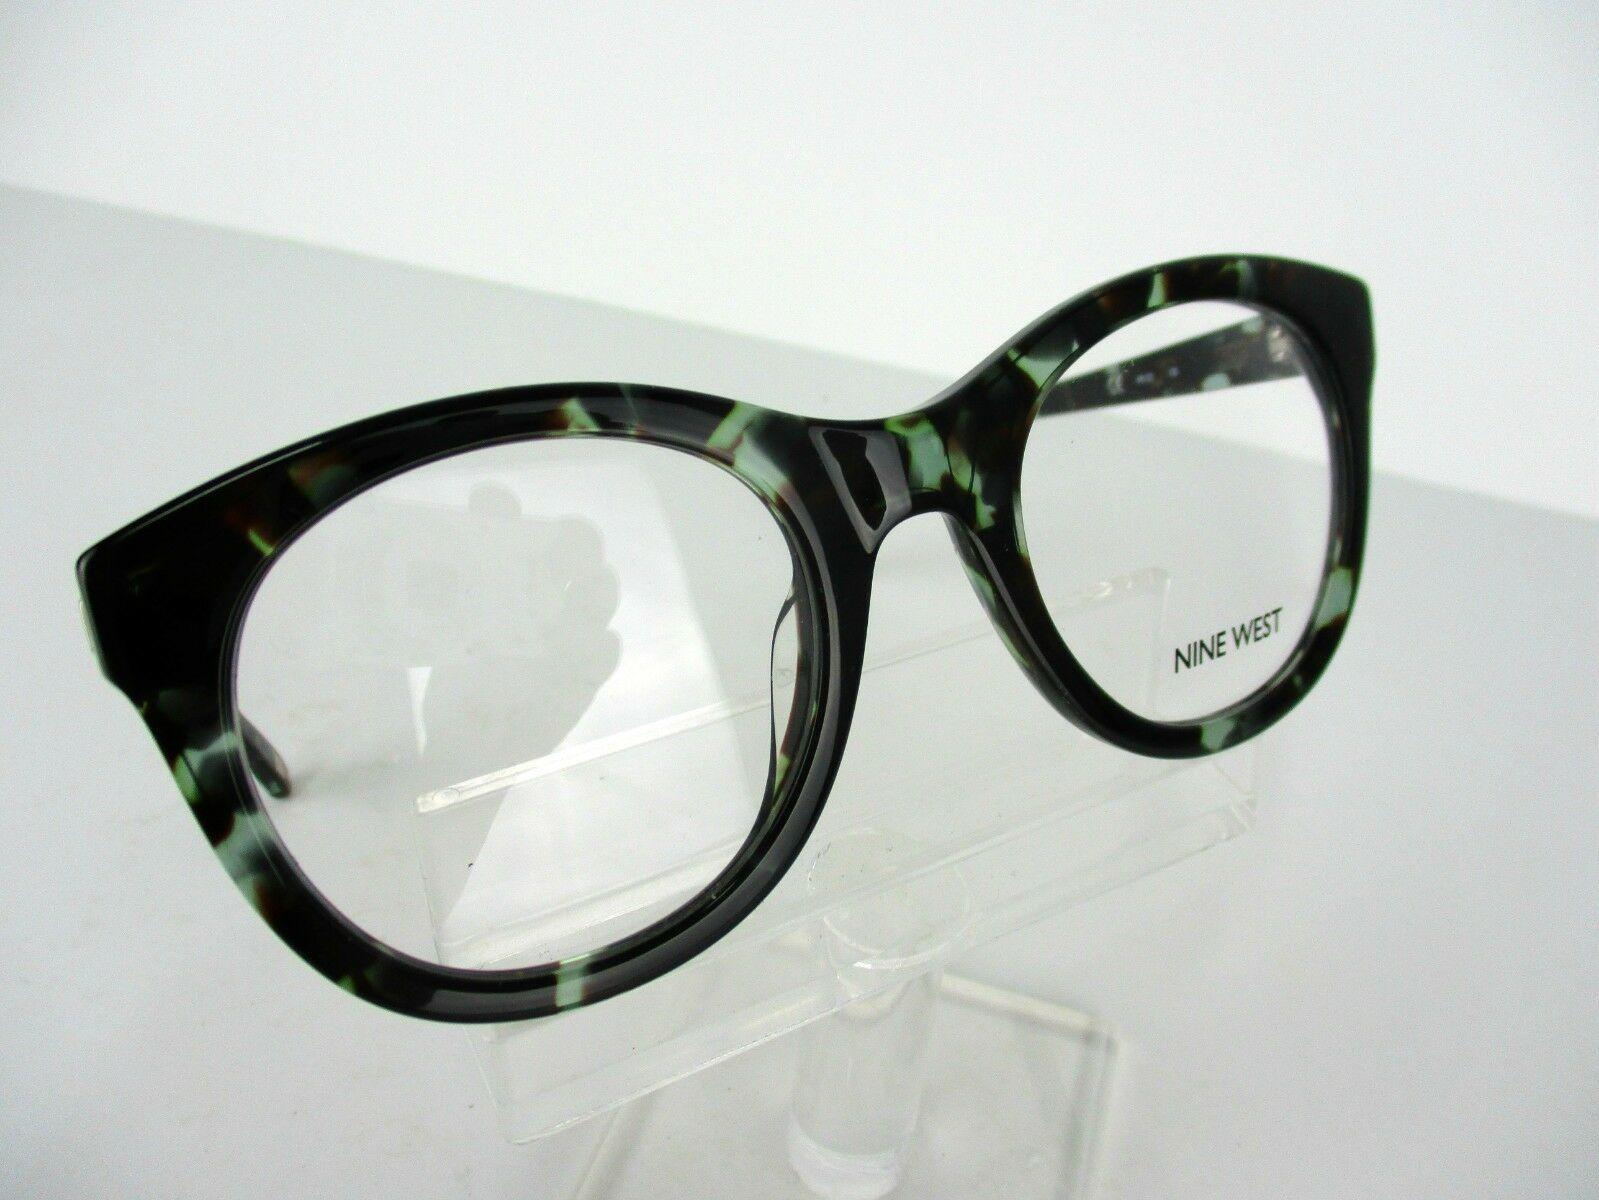 Nine West NW 5075 (442)  Aqua Tortoise.49 X 22 135 mm Eyeglass Frame